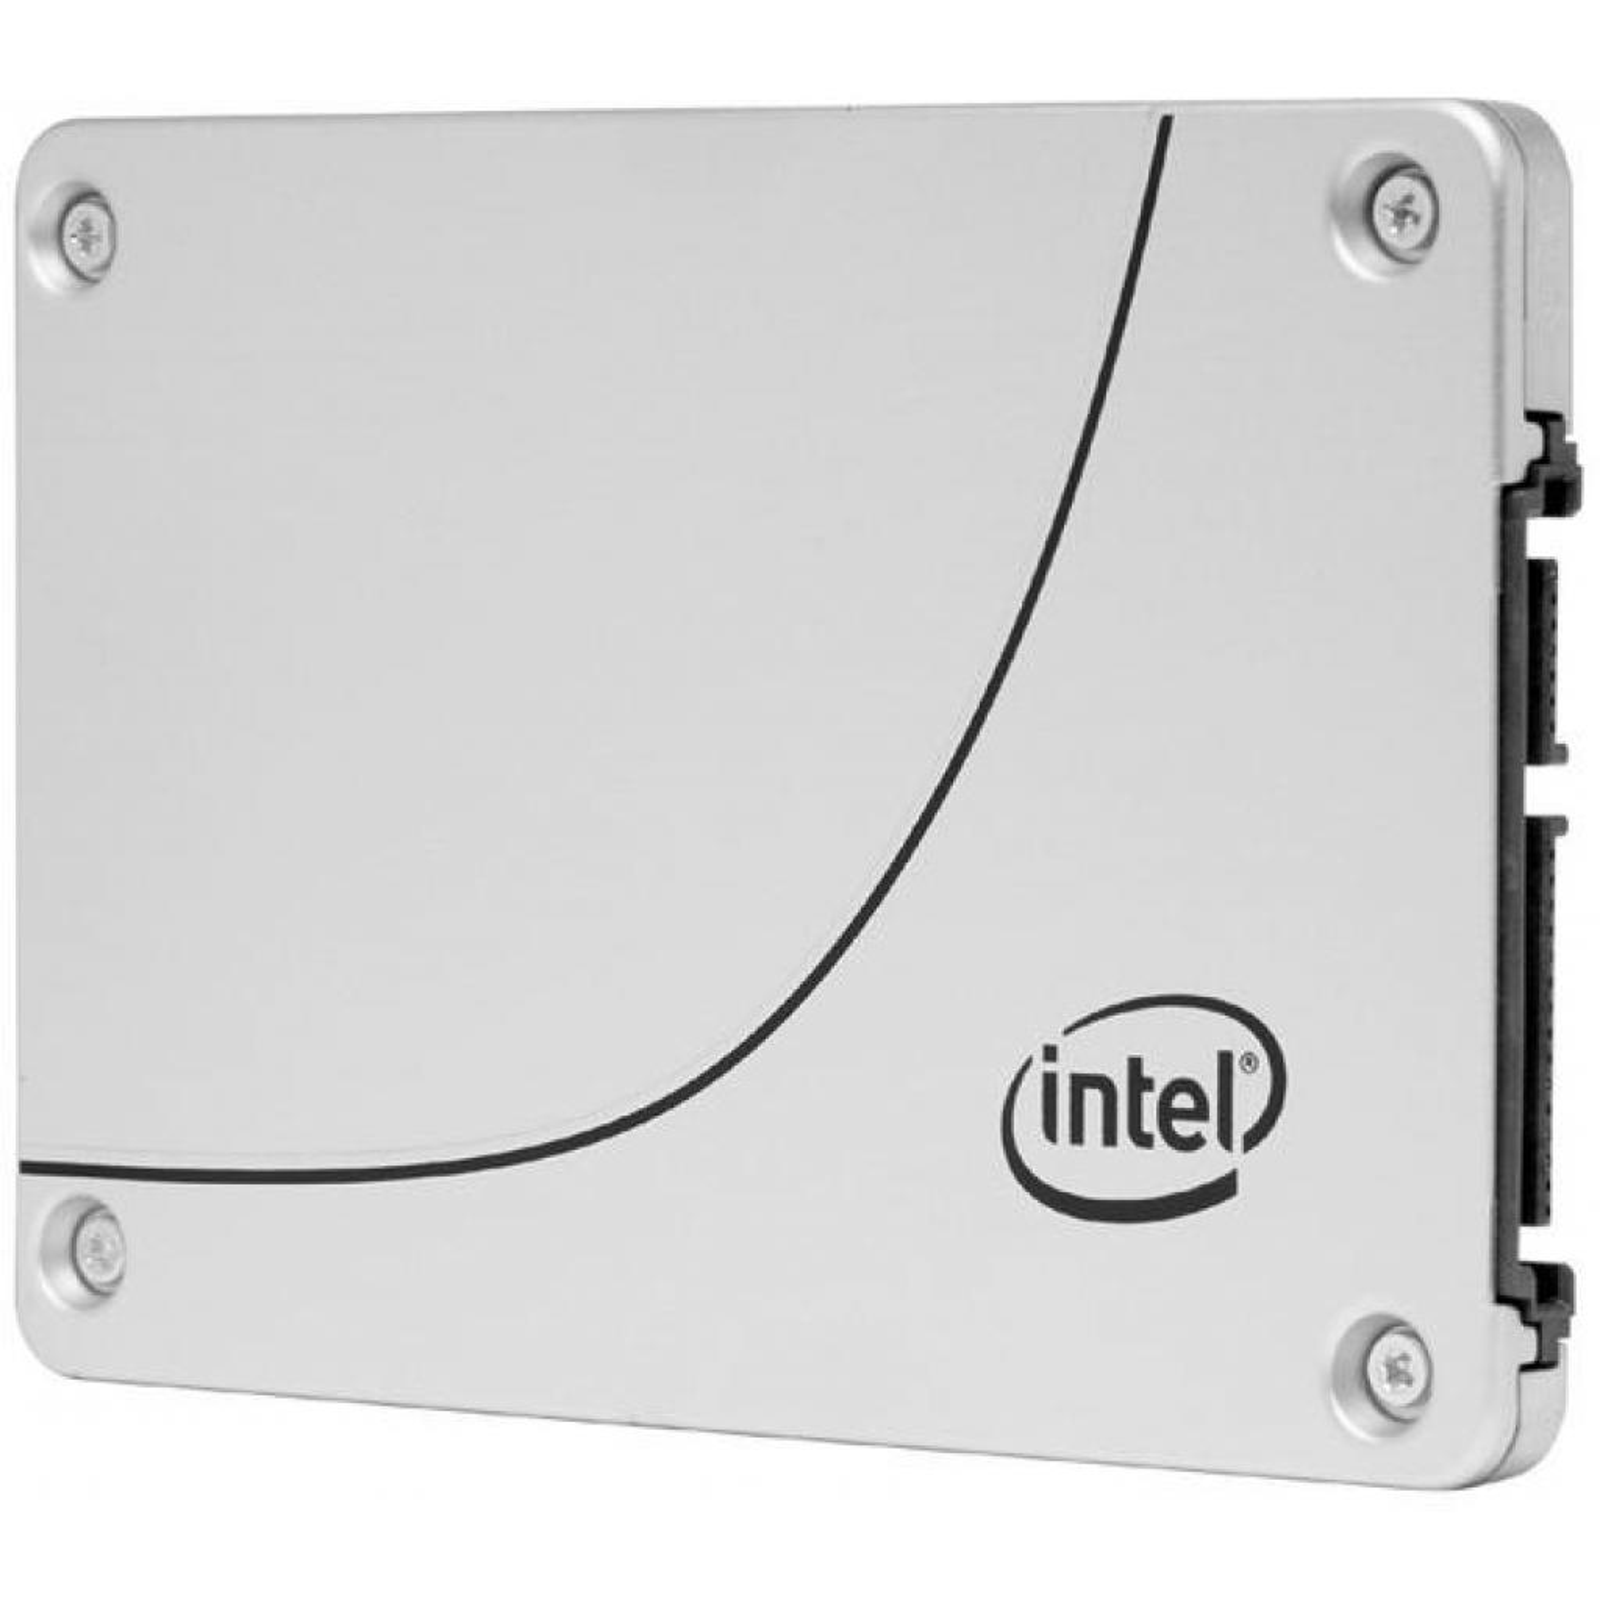 "Накопитель SSD 2.5"" 240GB INTEL (SSDSC2KB240G701) изображение 3"